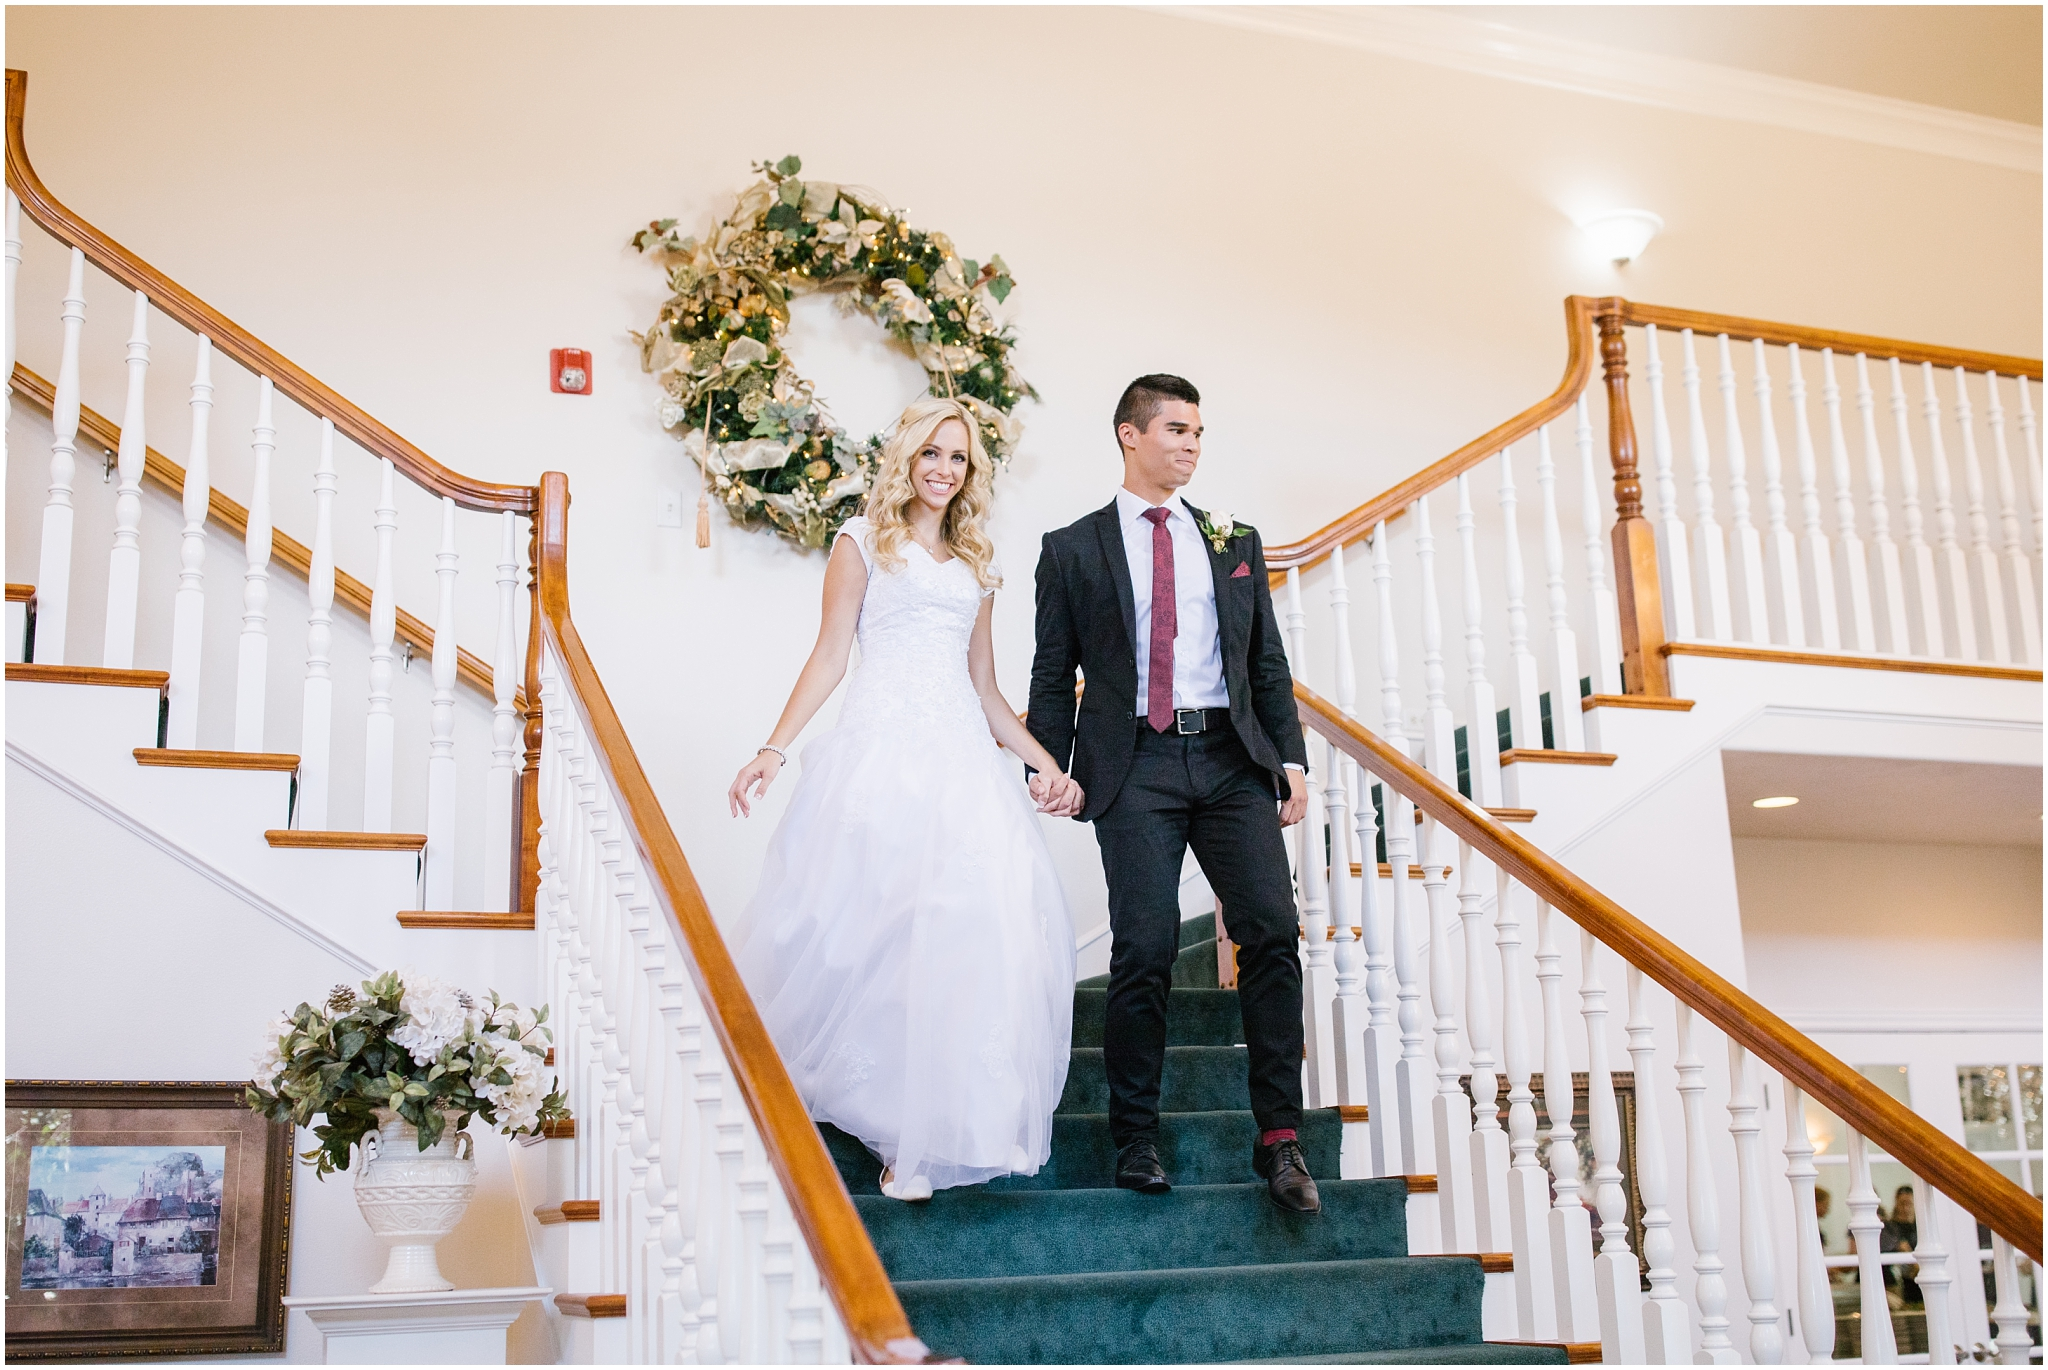 HannahChaseWedding-223_Lizzie-B-Imagery-Utah-Wedding-Photographer-Park-City-Salt-Lake-City-Payson-Temple-Clarion-Garden-Center.jpg